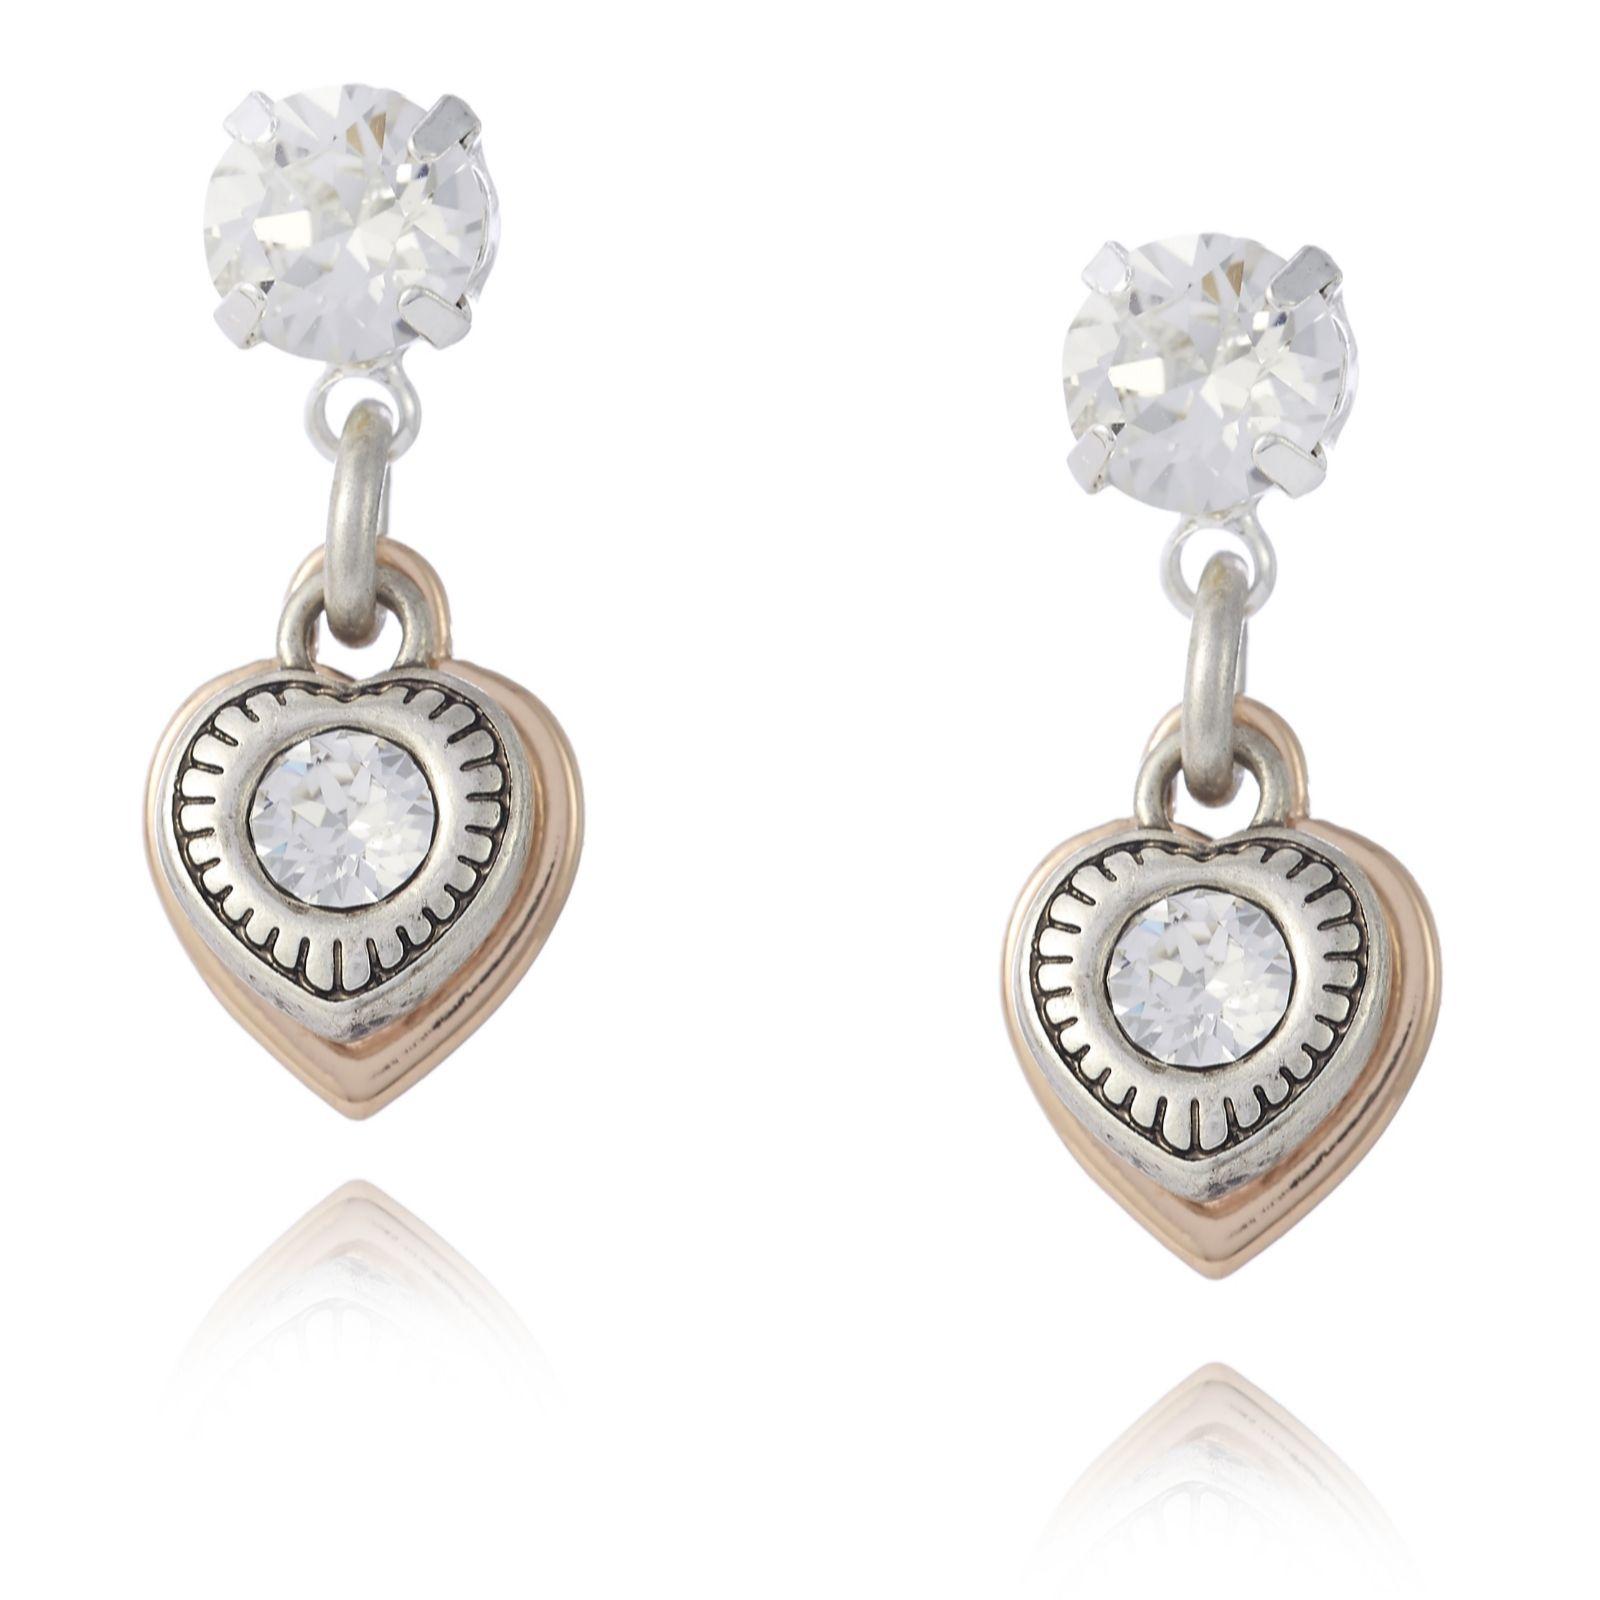 Molton Brown Bath And Shower Bibi Bijoux Crystal Heart Charm Earrings Qvc Uk